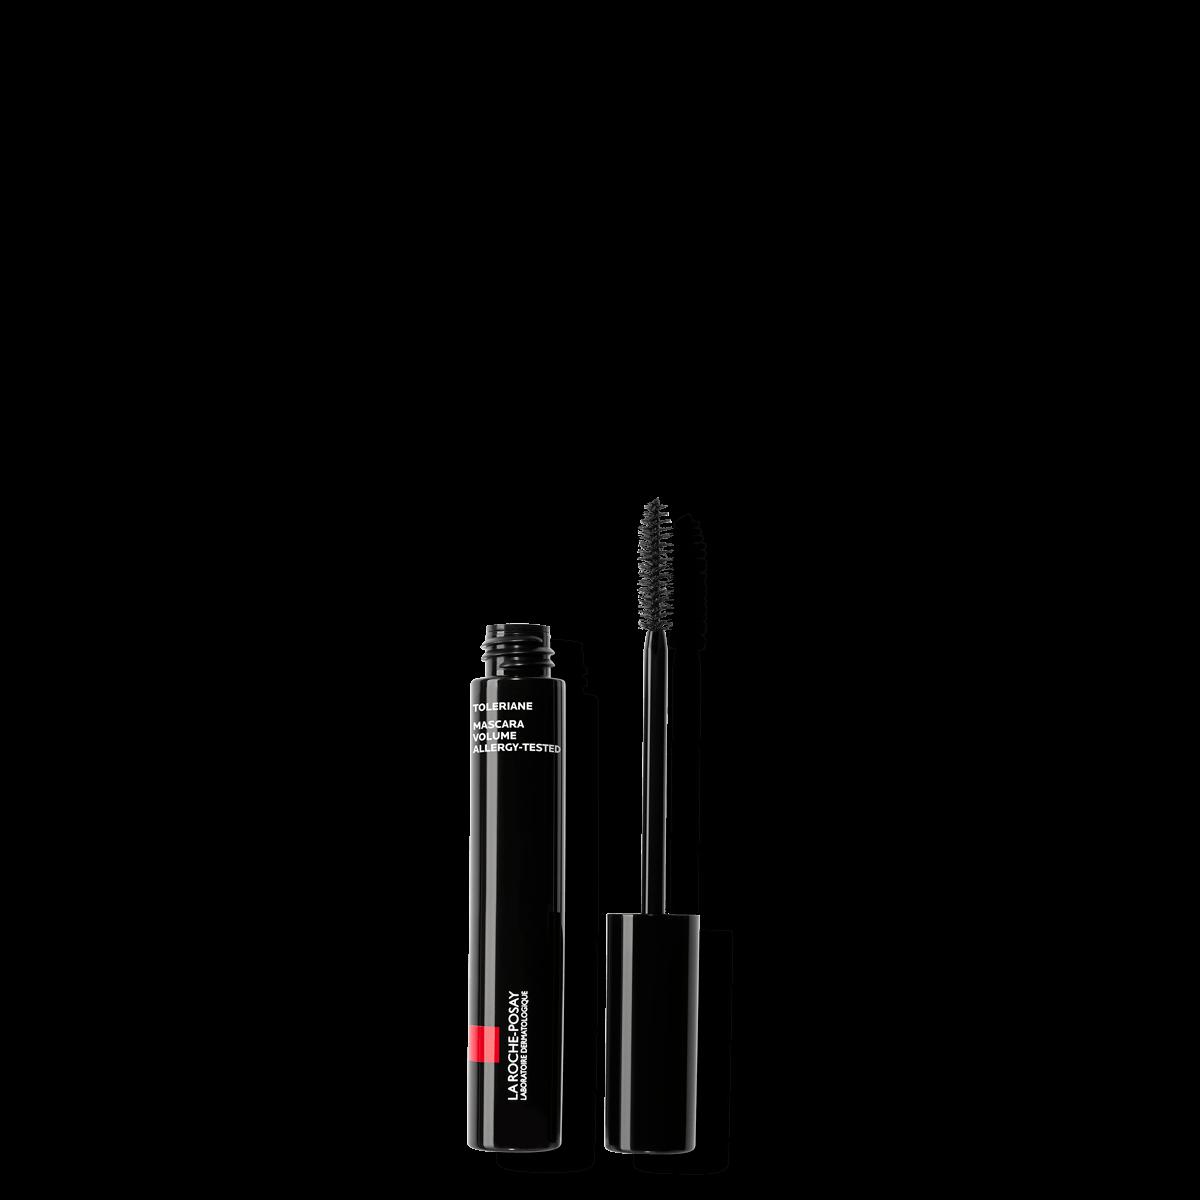 La Roche Posay Sensitiv Toleriane Sminke VOLUME MASCARA Brun 333787